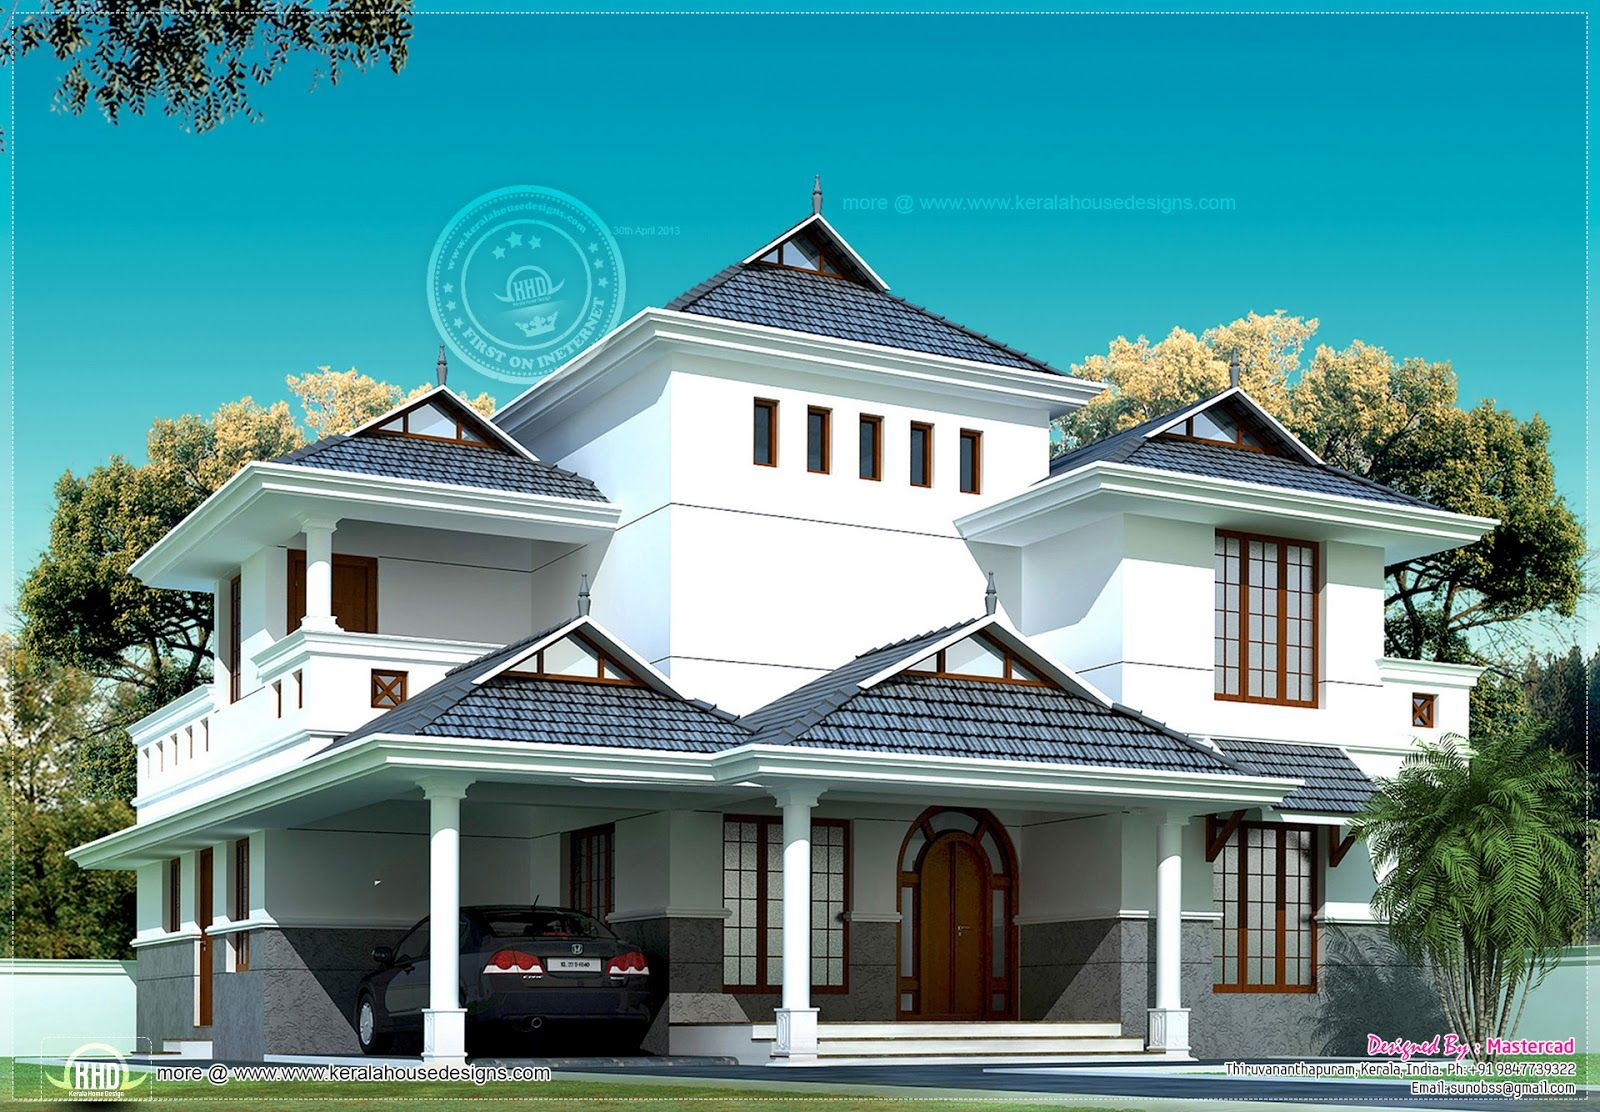 Kerala Model Villa In 2020 Square Feet Villa Design Free House Plans House Styles